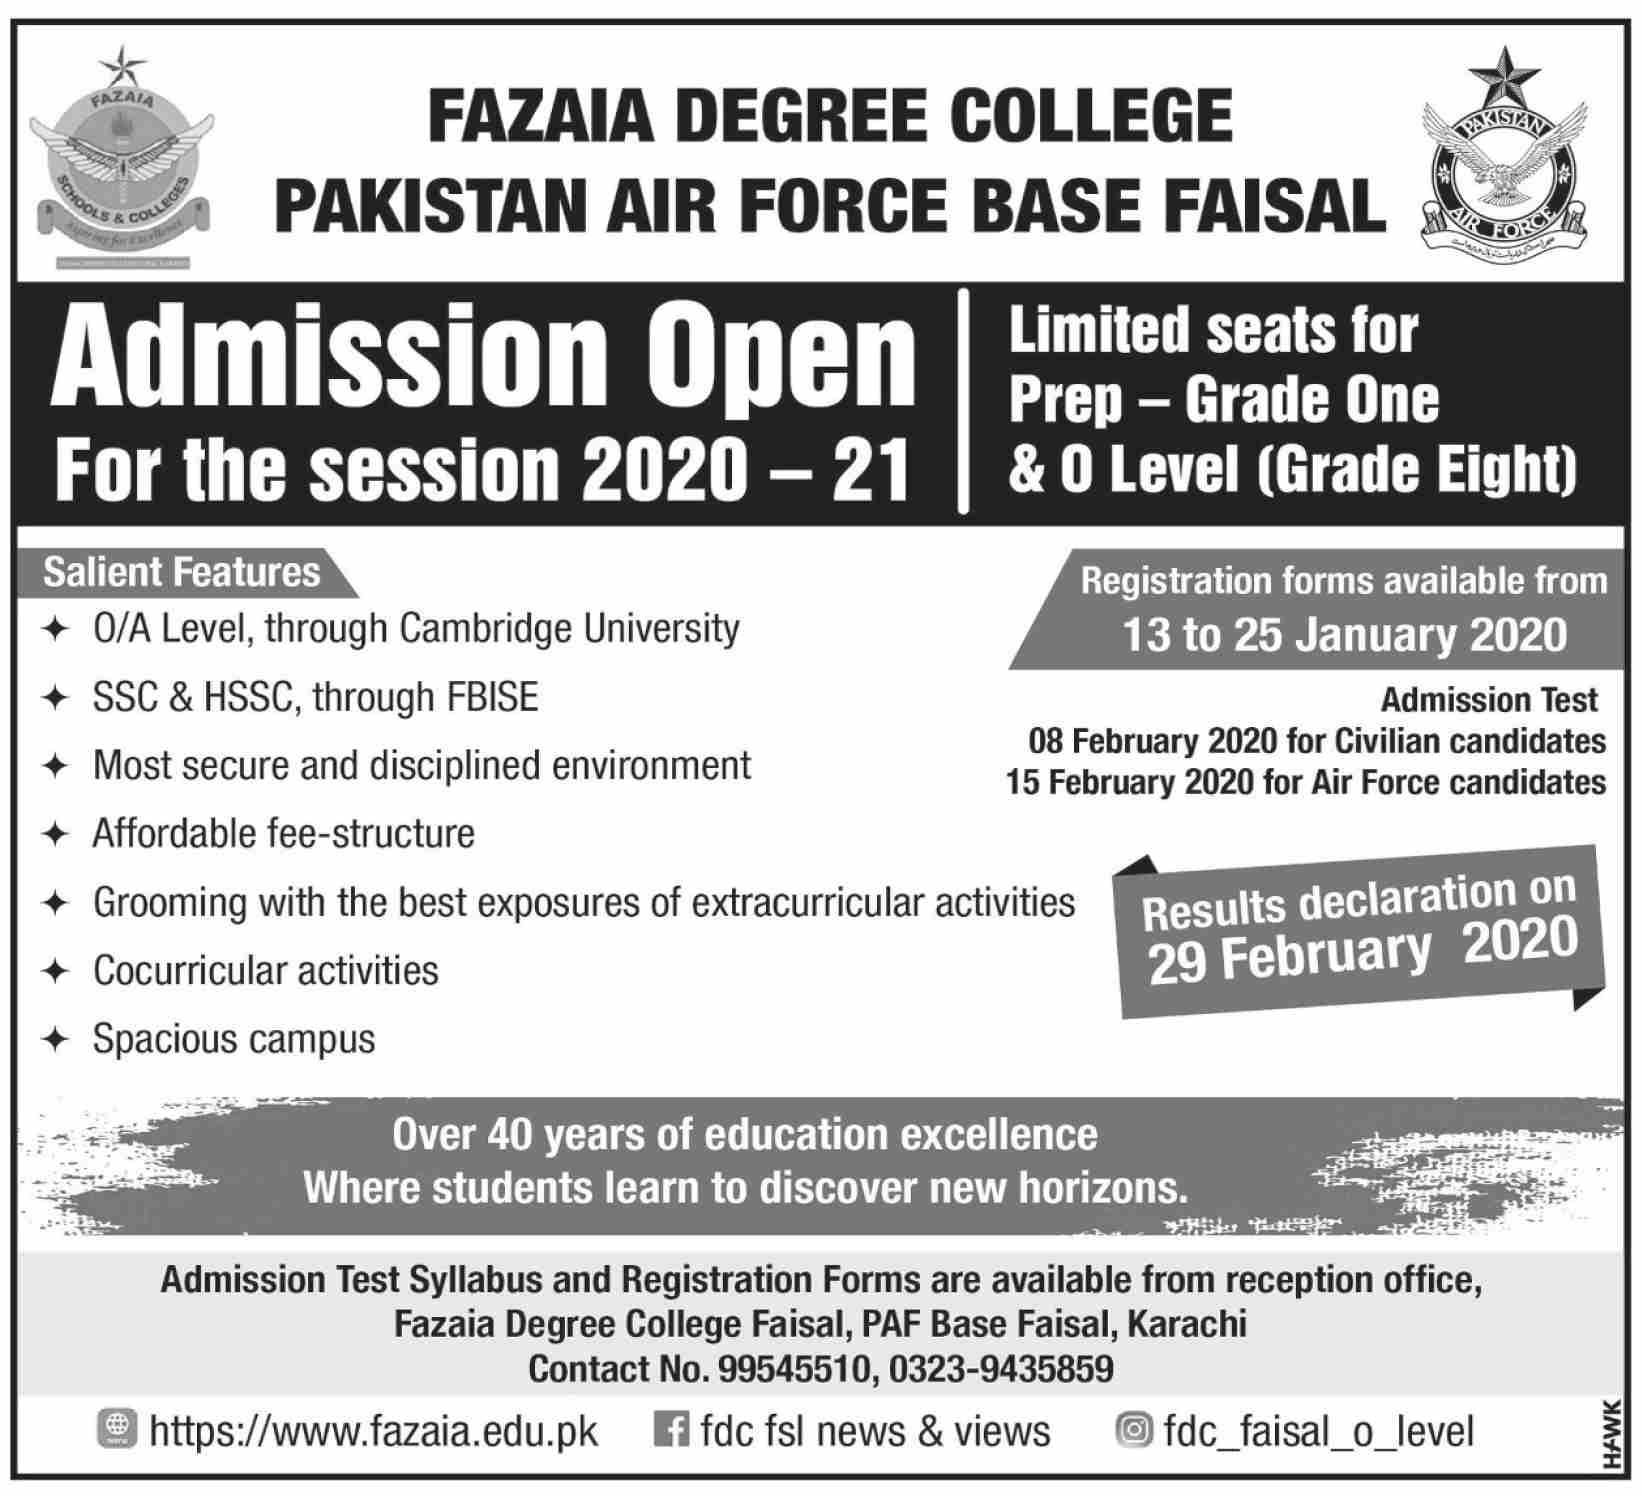 Fazaia Degree College Karachi Admissions